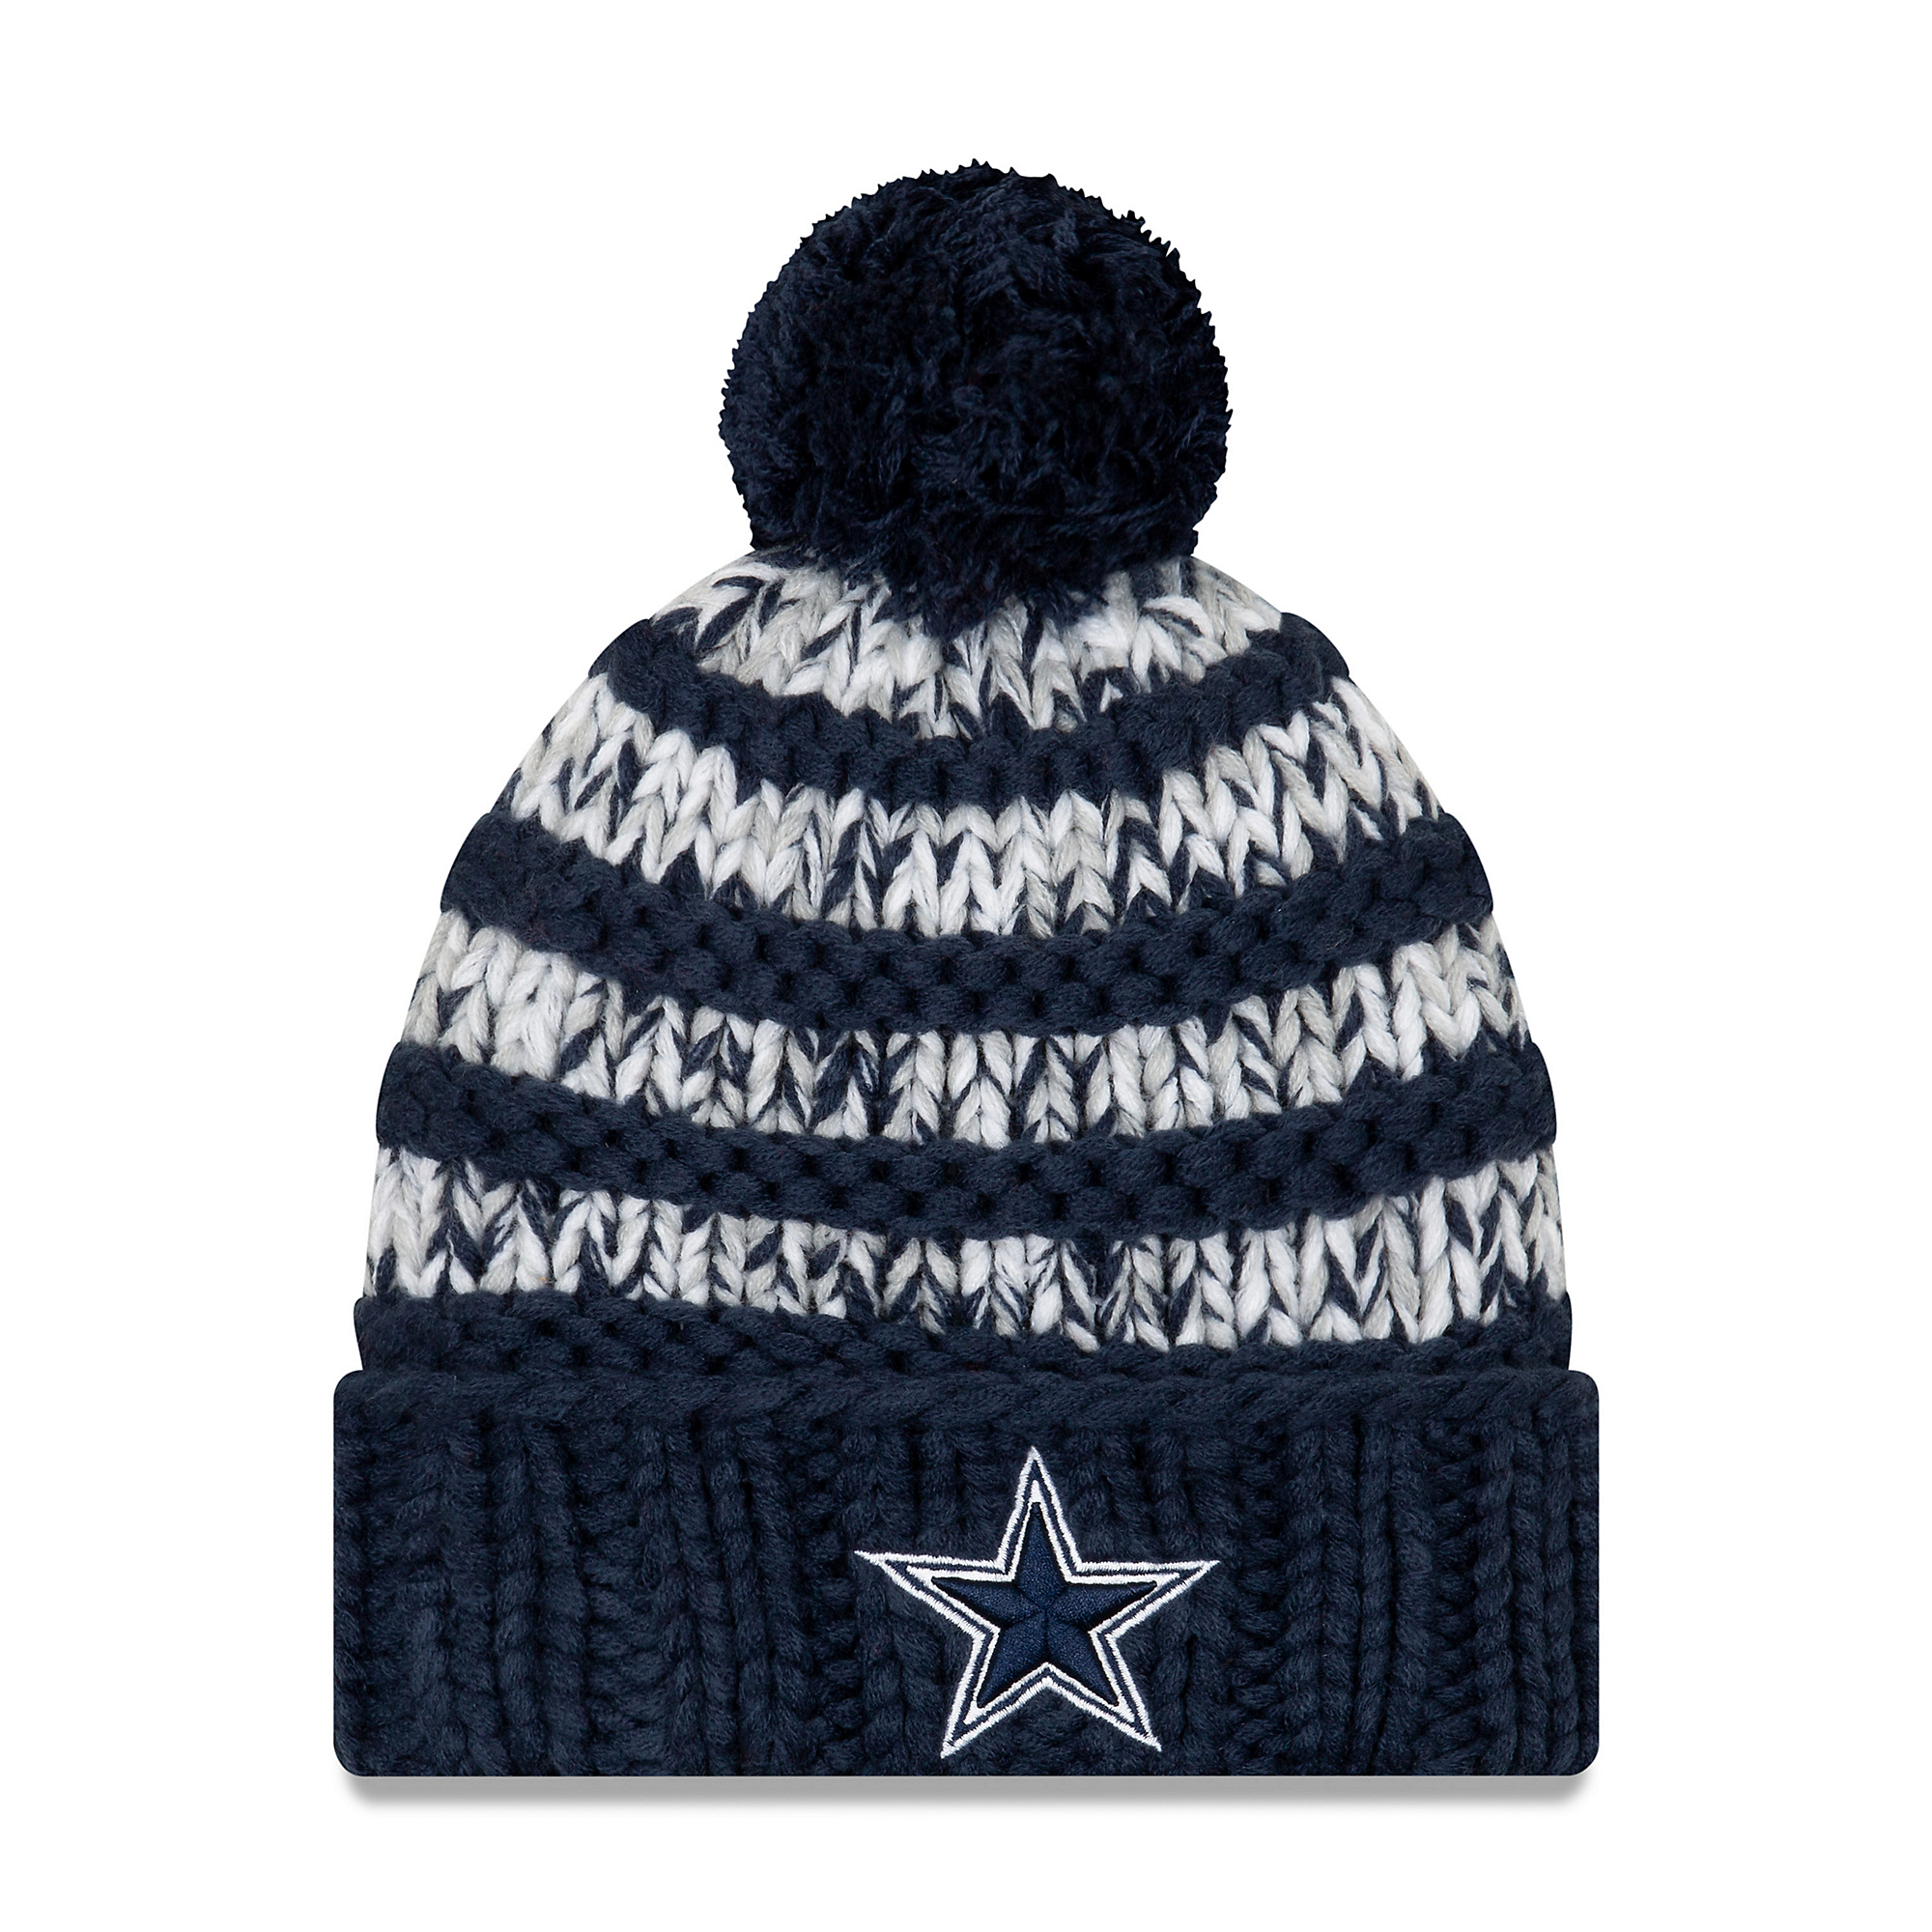 Dallas Cowboys New Era Womens Layer Knit Hat